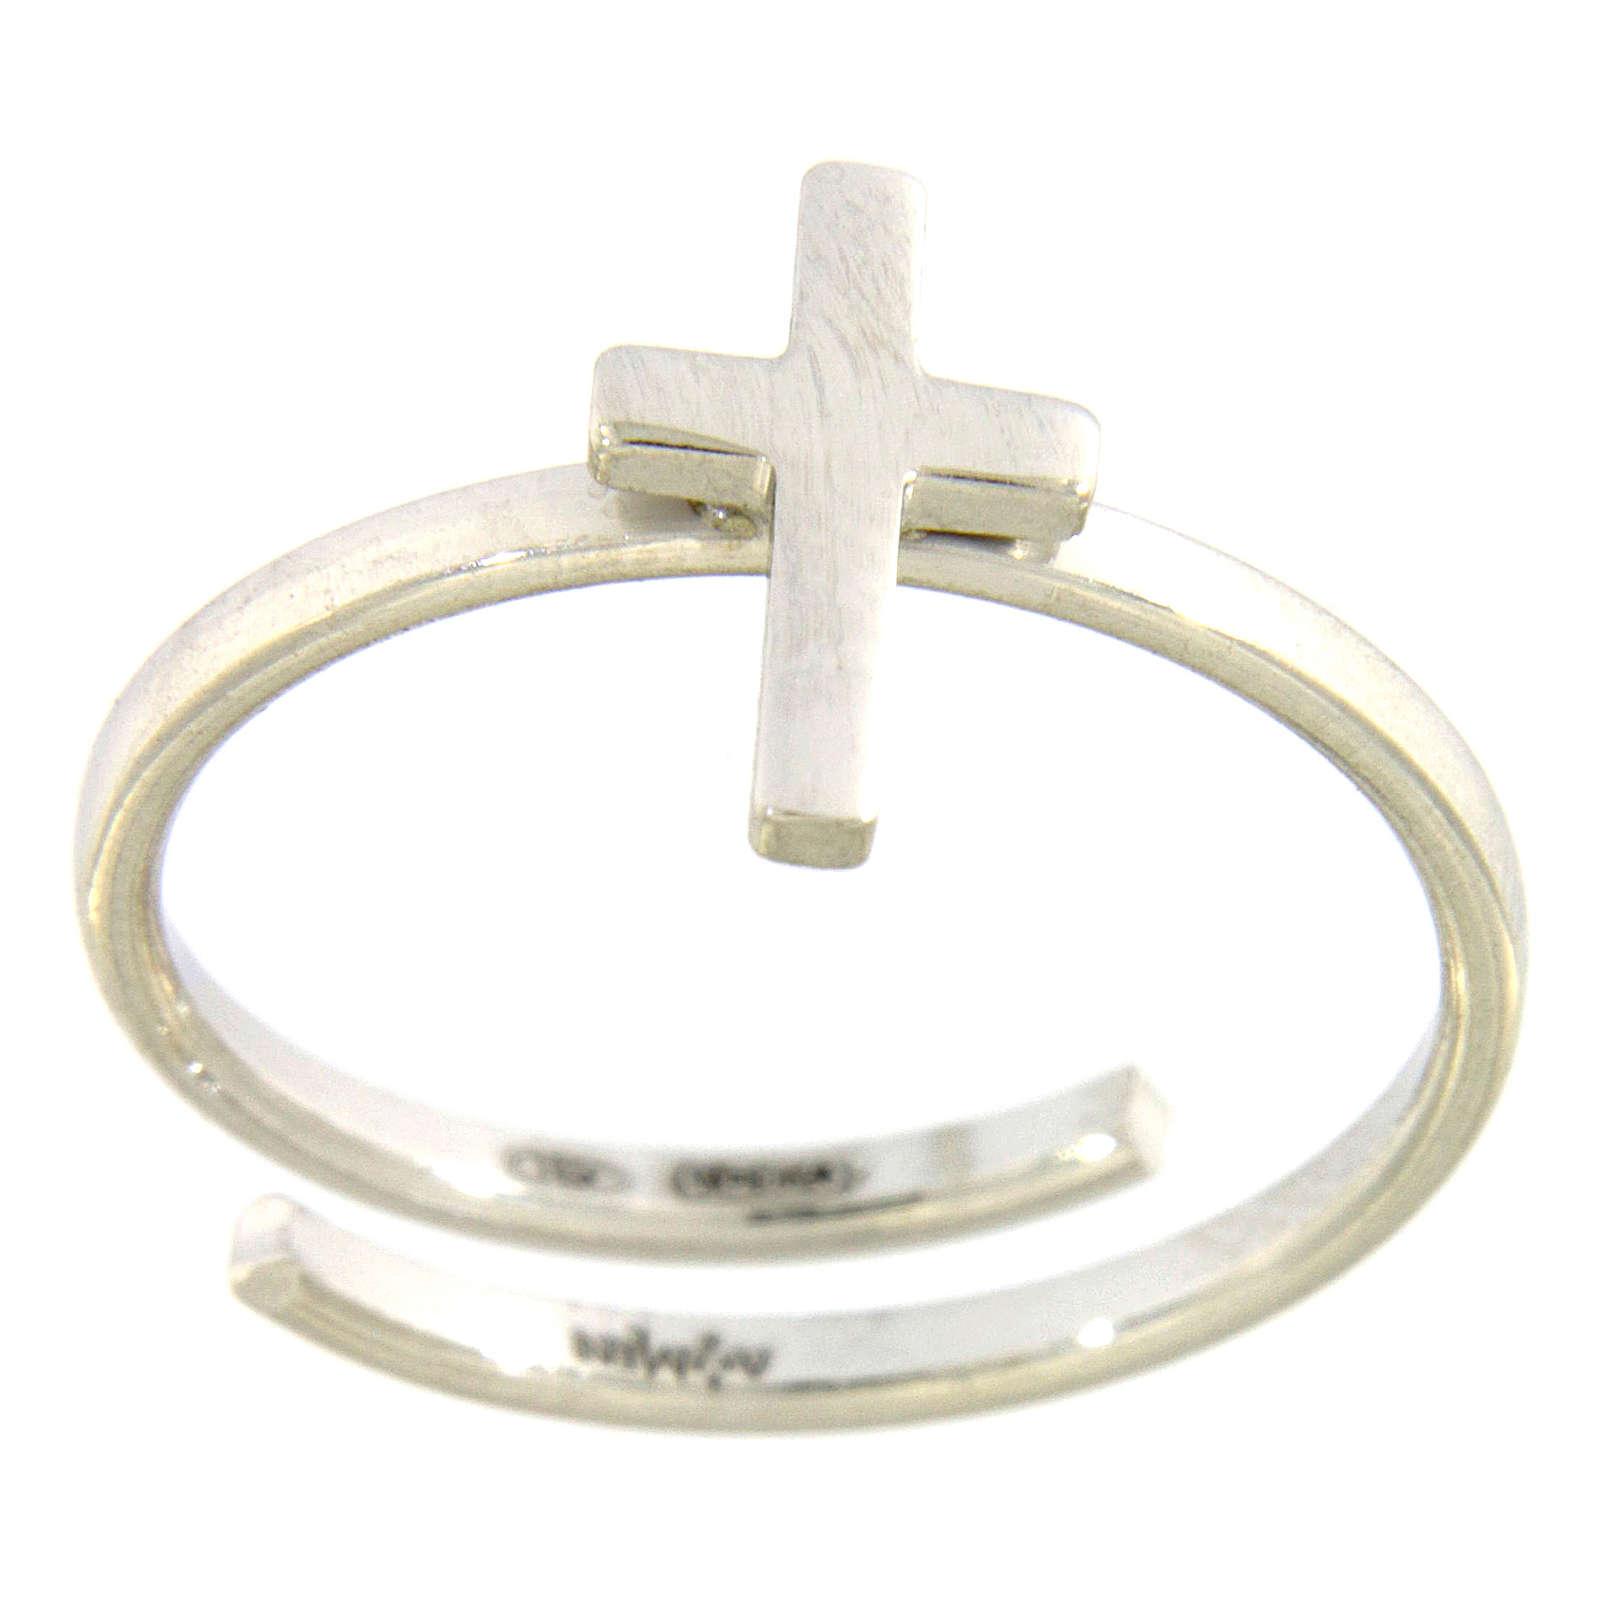 Bague spirale AMEN croix argent 925 fin. rhodium 3